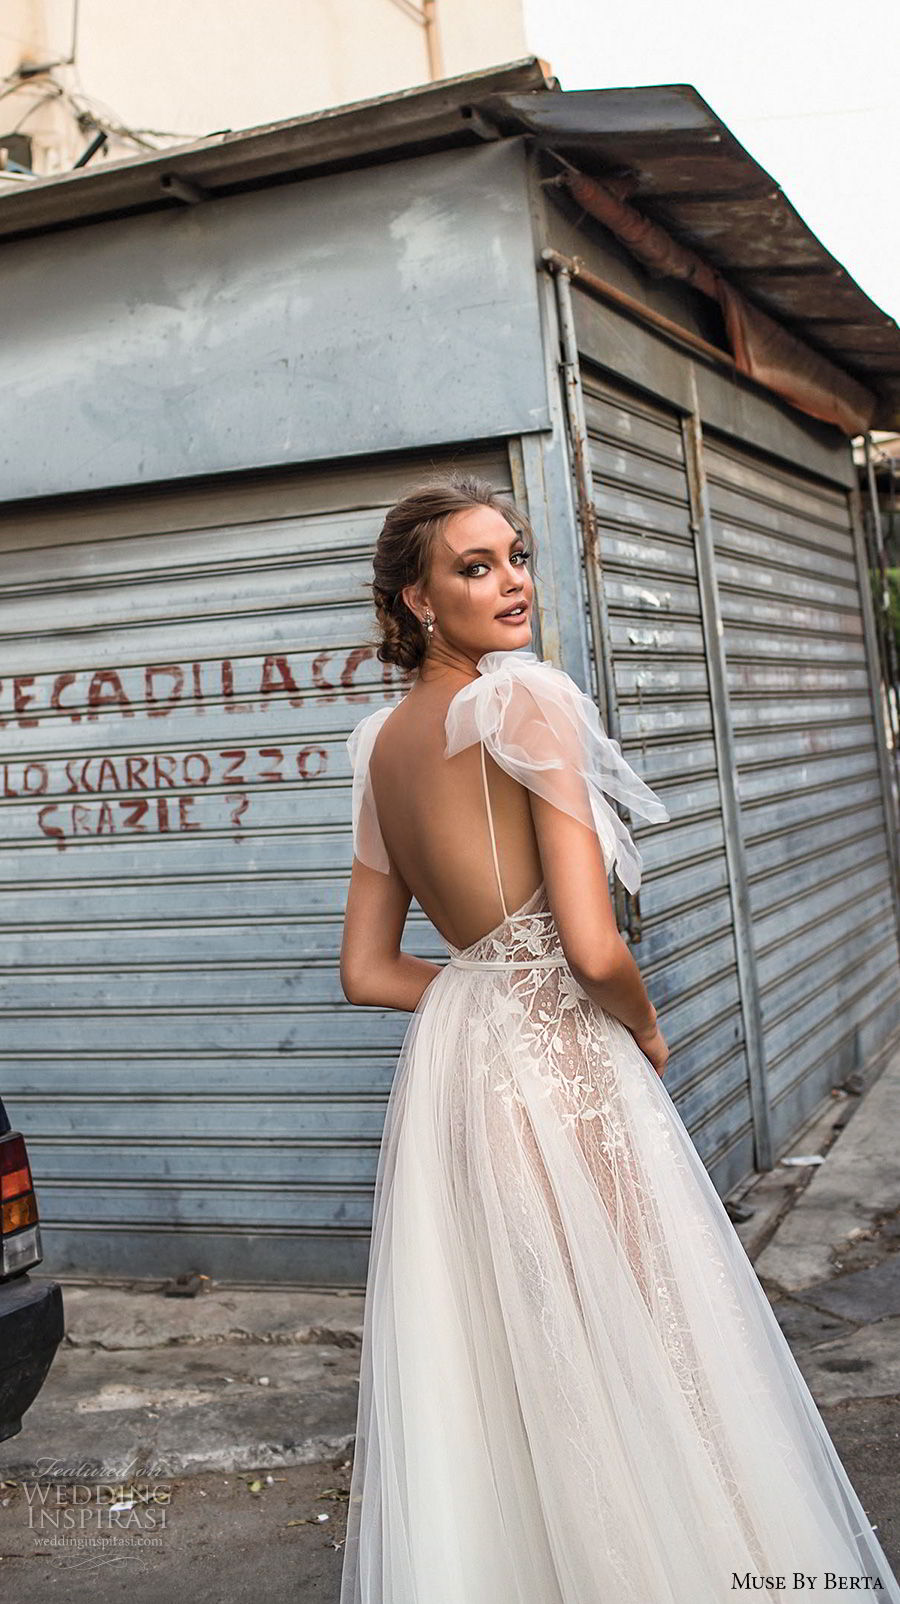 muse-berta-2018-bridal-sleeveless-deep-v-neck-heavily-embellished-bodice-tulle-skirt-romantic-a-line-wedding-dress-open-back-sweep-train-16-bv